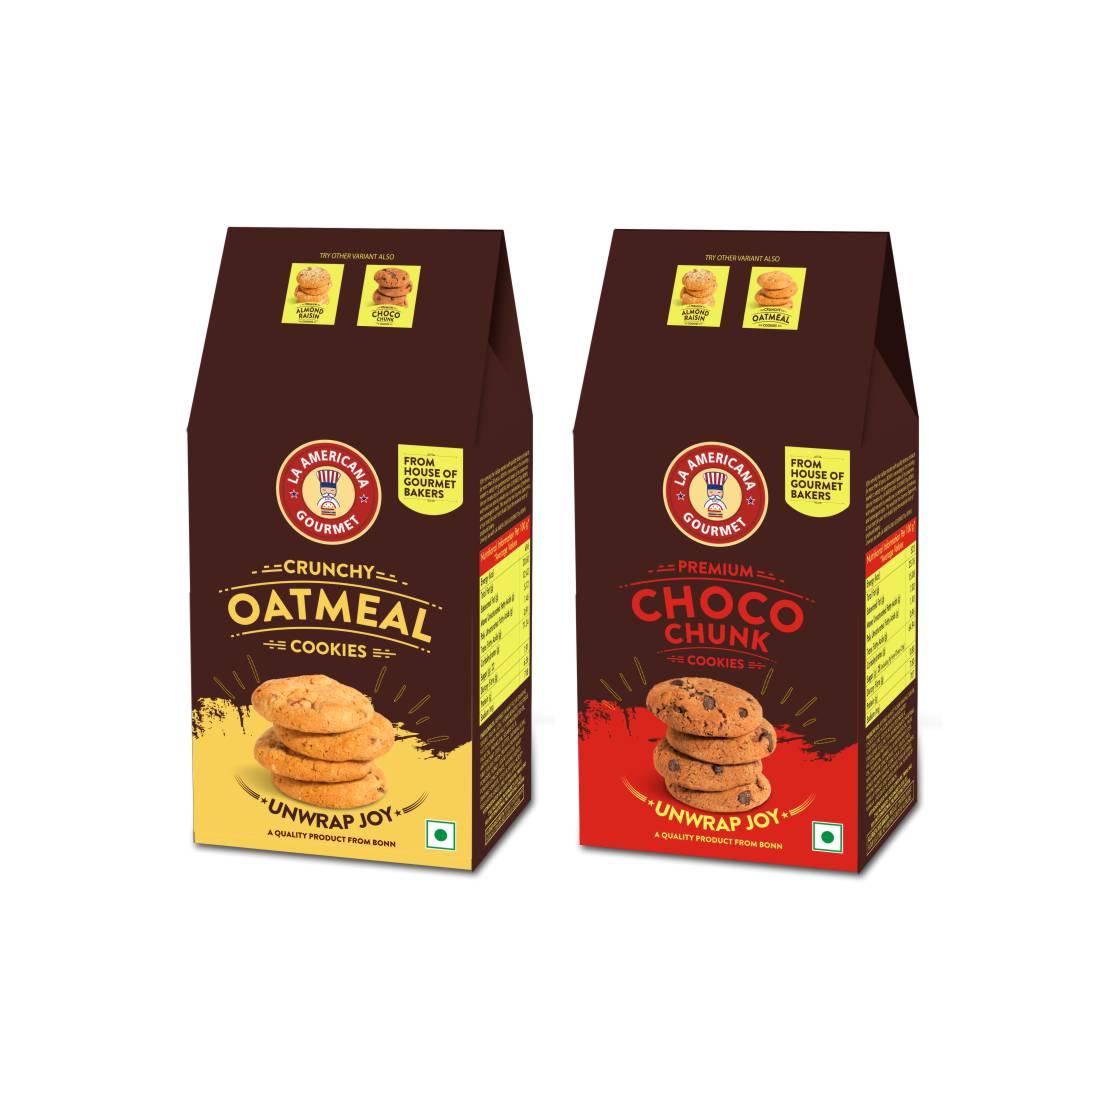 LA Americana Multi Pack Oatmeal and Chocochunk Cookies, TWO pack each